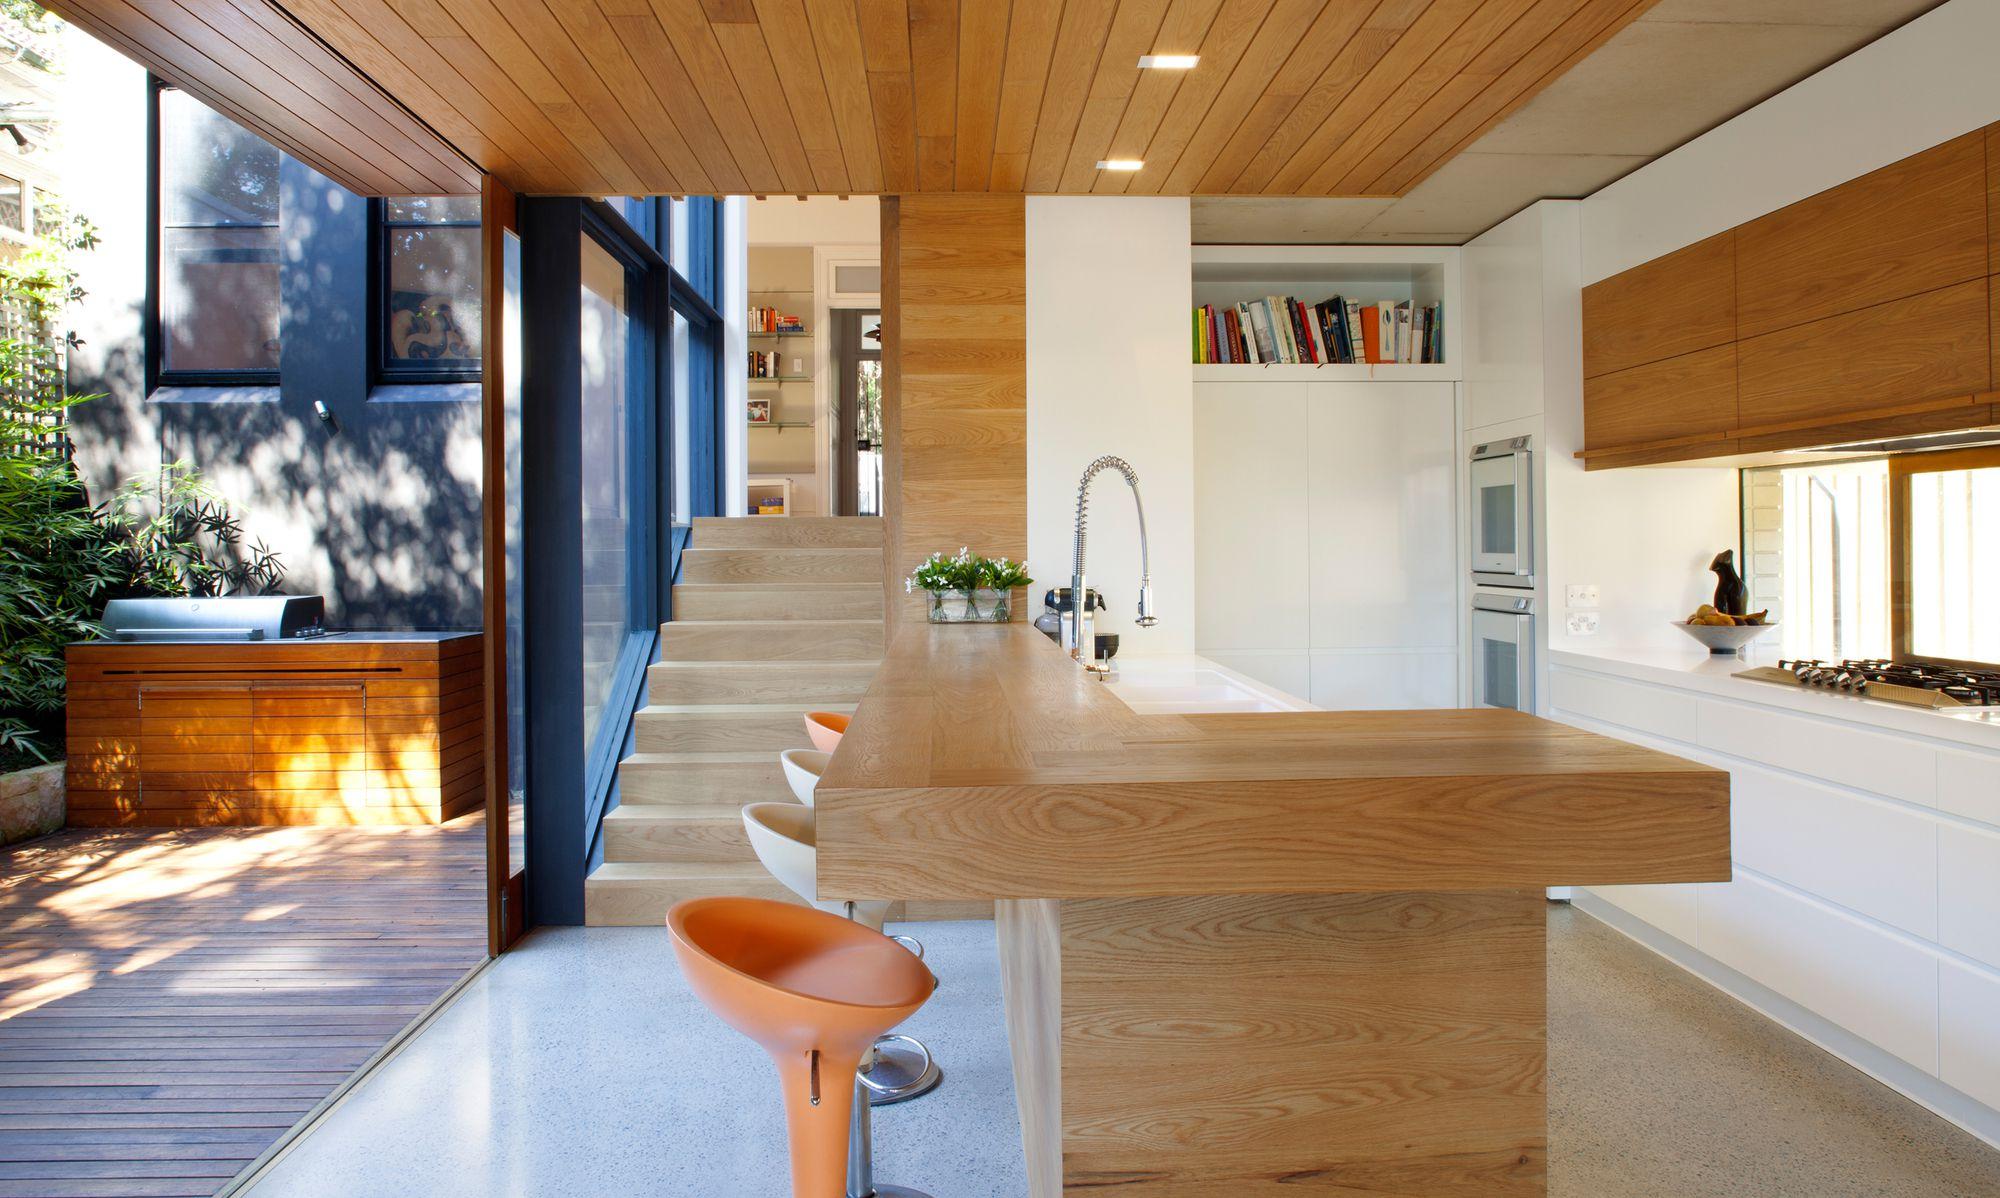 504975f528ba0d0c5600019b_queen-s-park-house-fox-johnston_interior